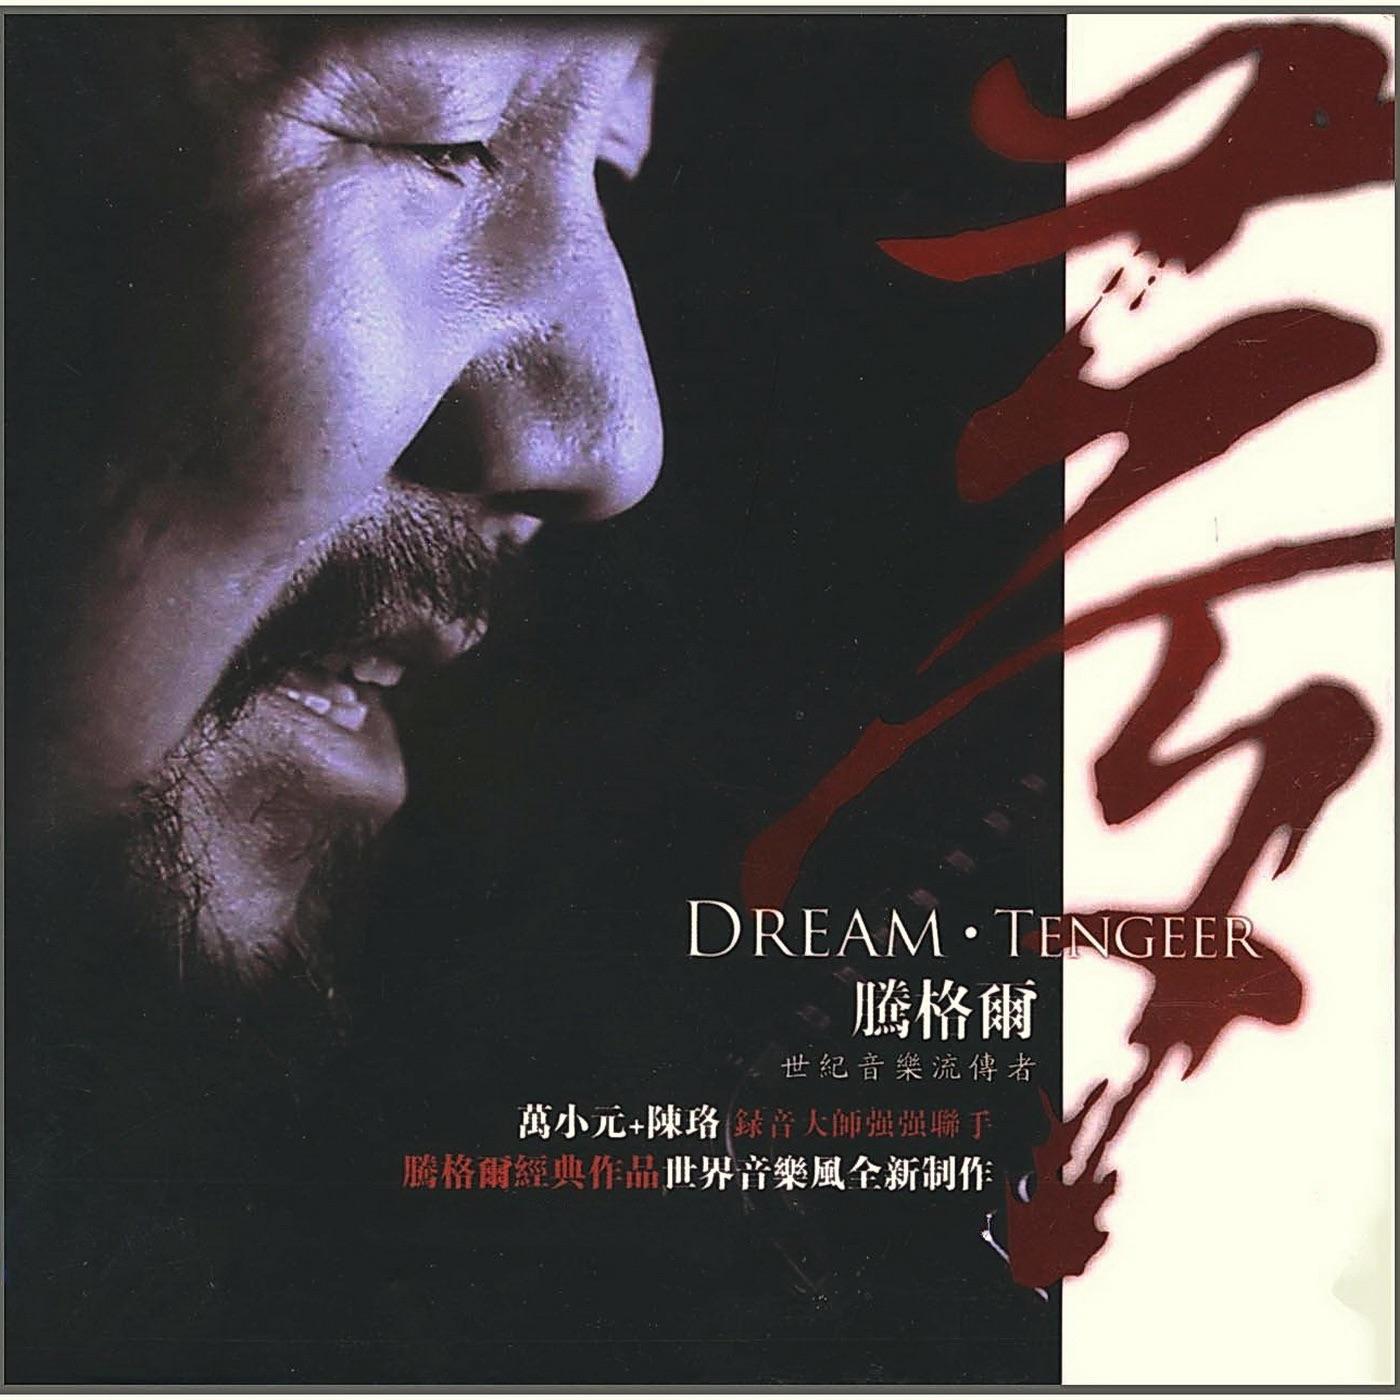 Genre Chinese Regional Folkmusicchinesepopmandopop Price Free Origin Born Catalog Number